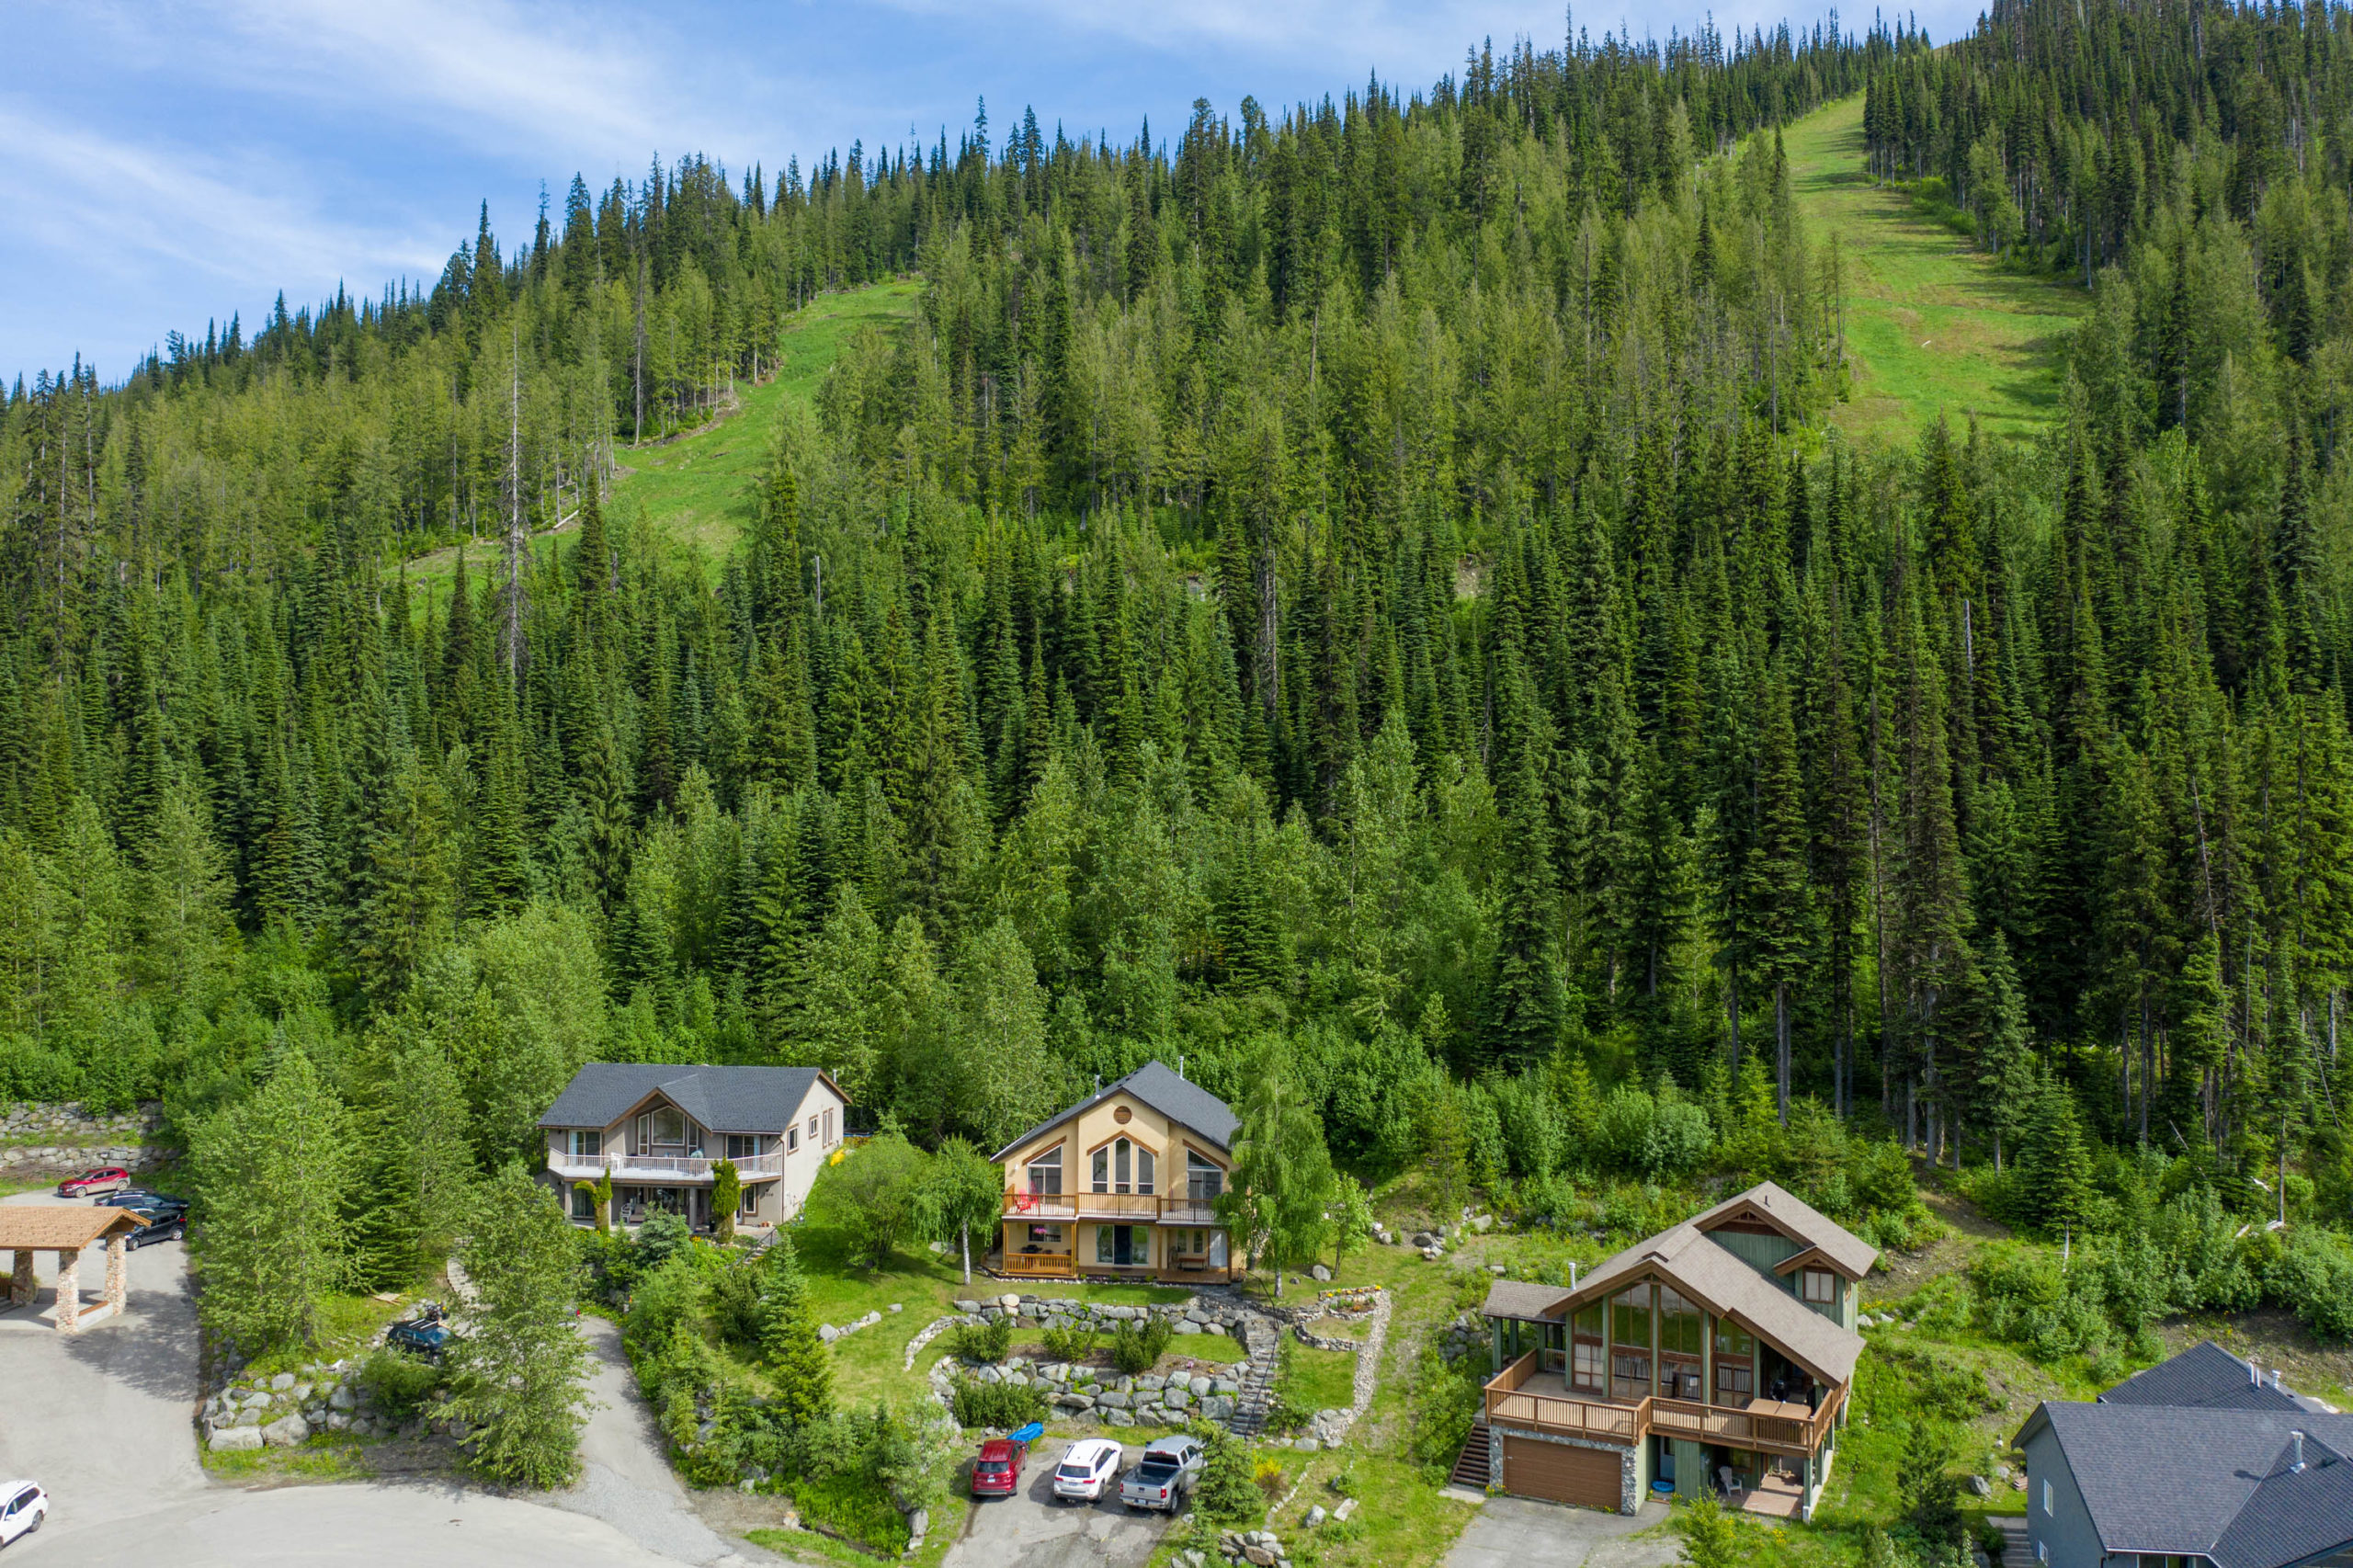 2504 Eagle Crt, Sun Peaks, Kamloops Real Estate for Sale